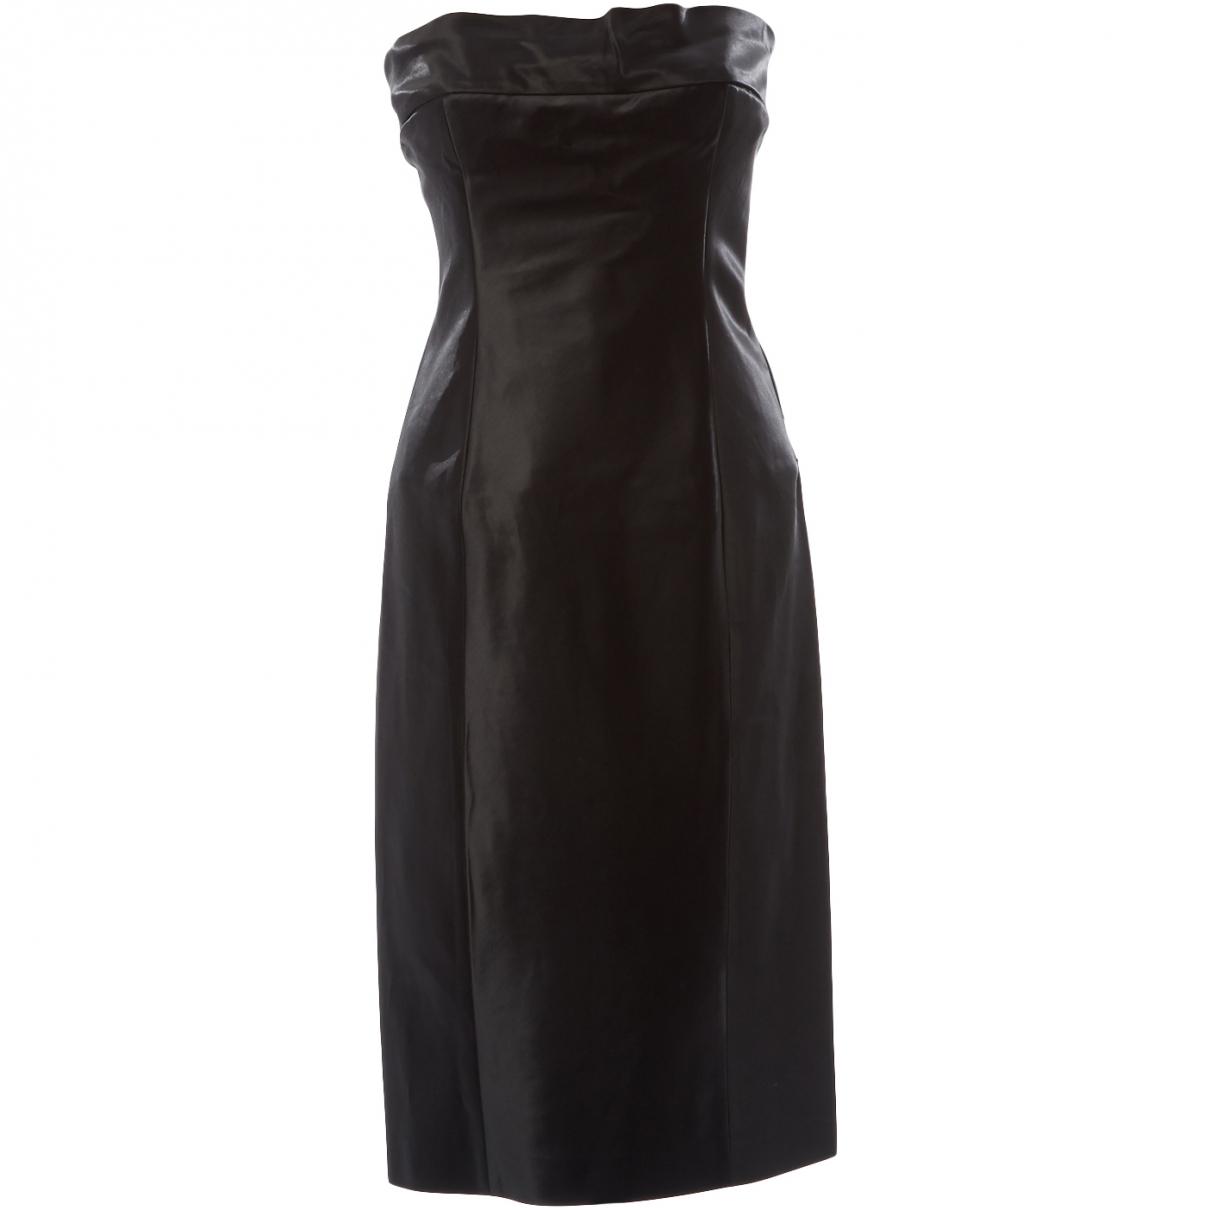 Gucci \N Black dress for Women 42 IT